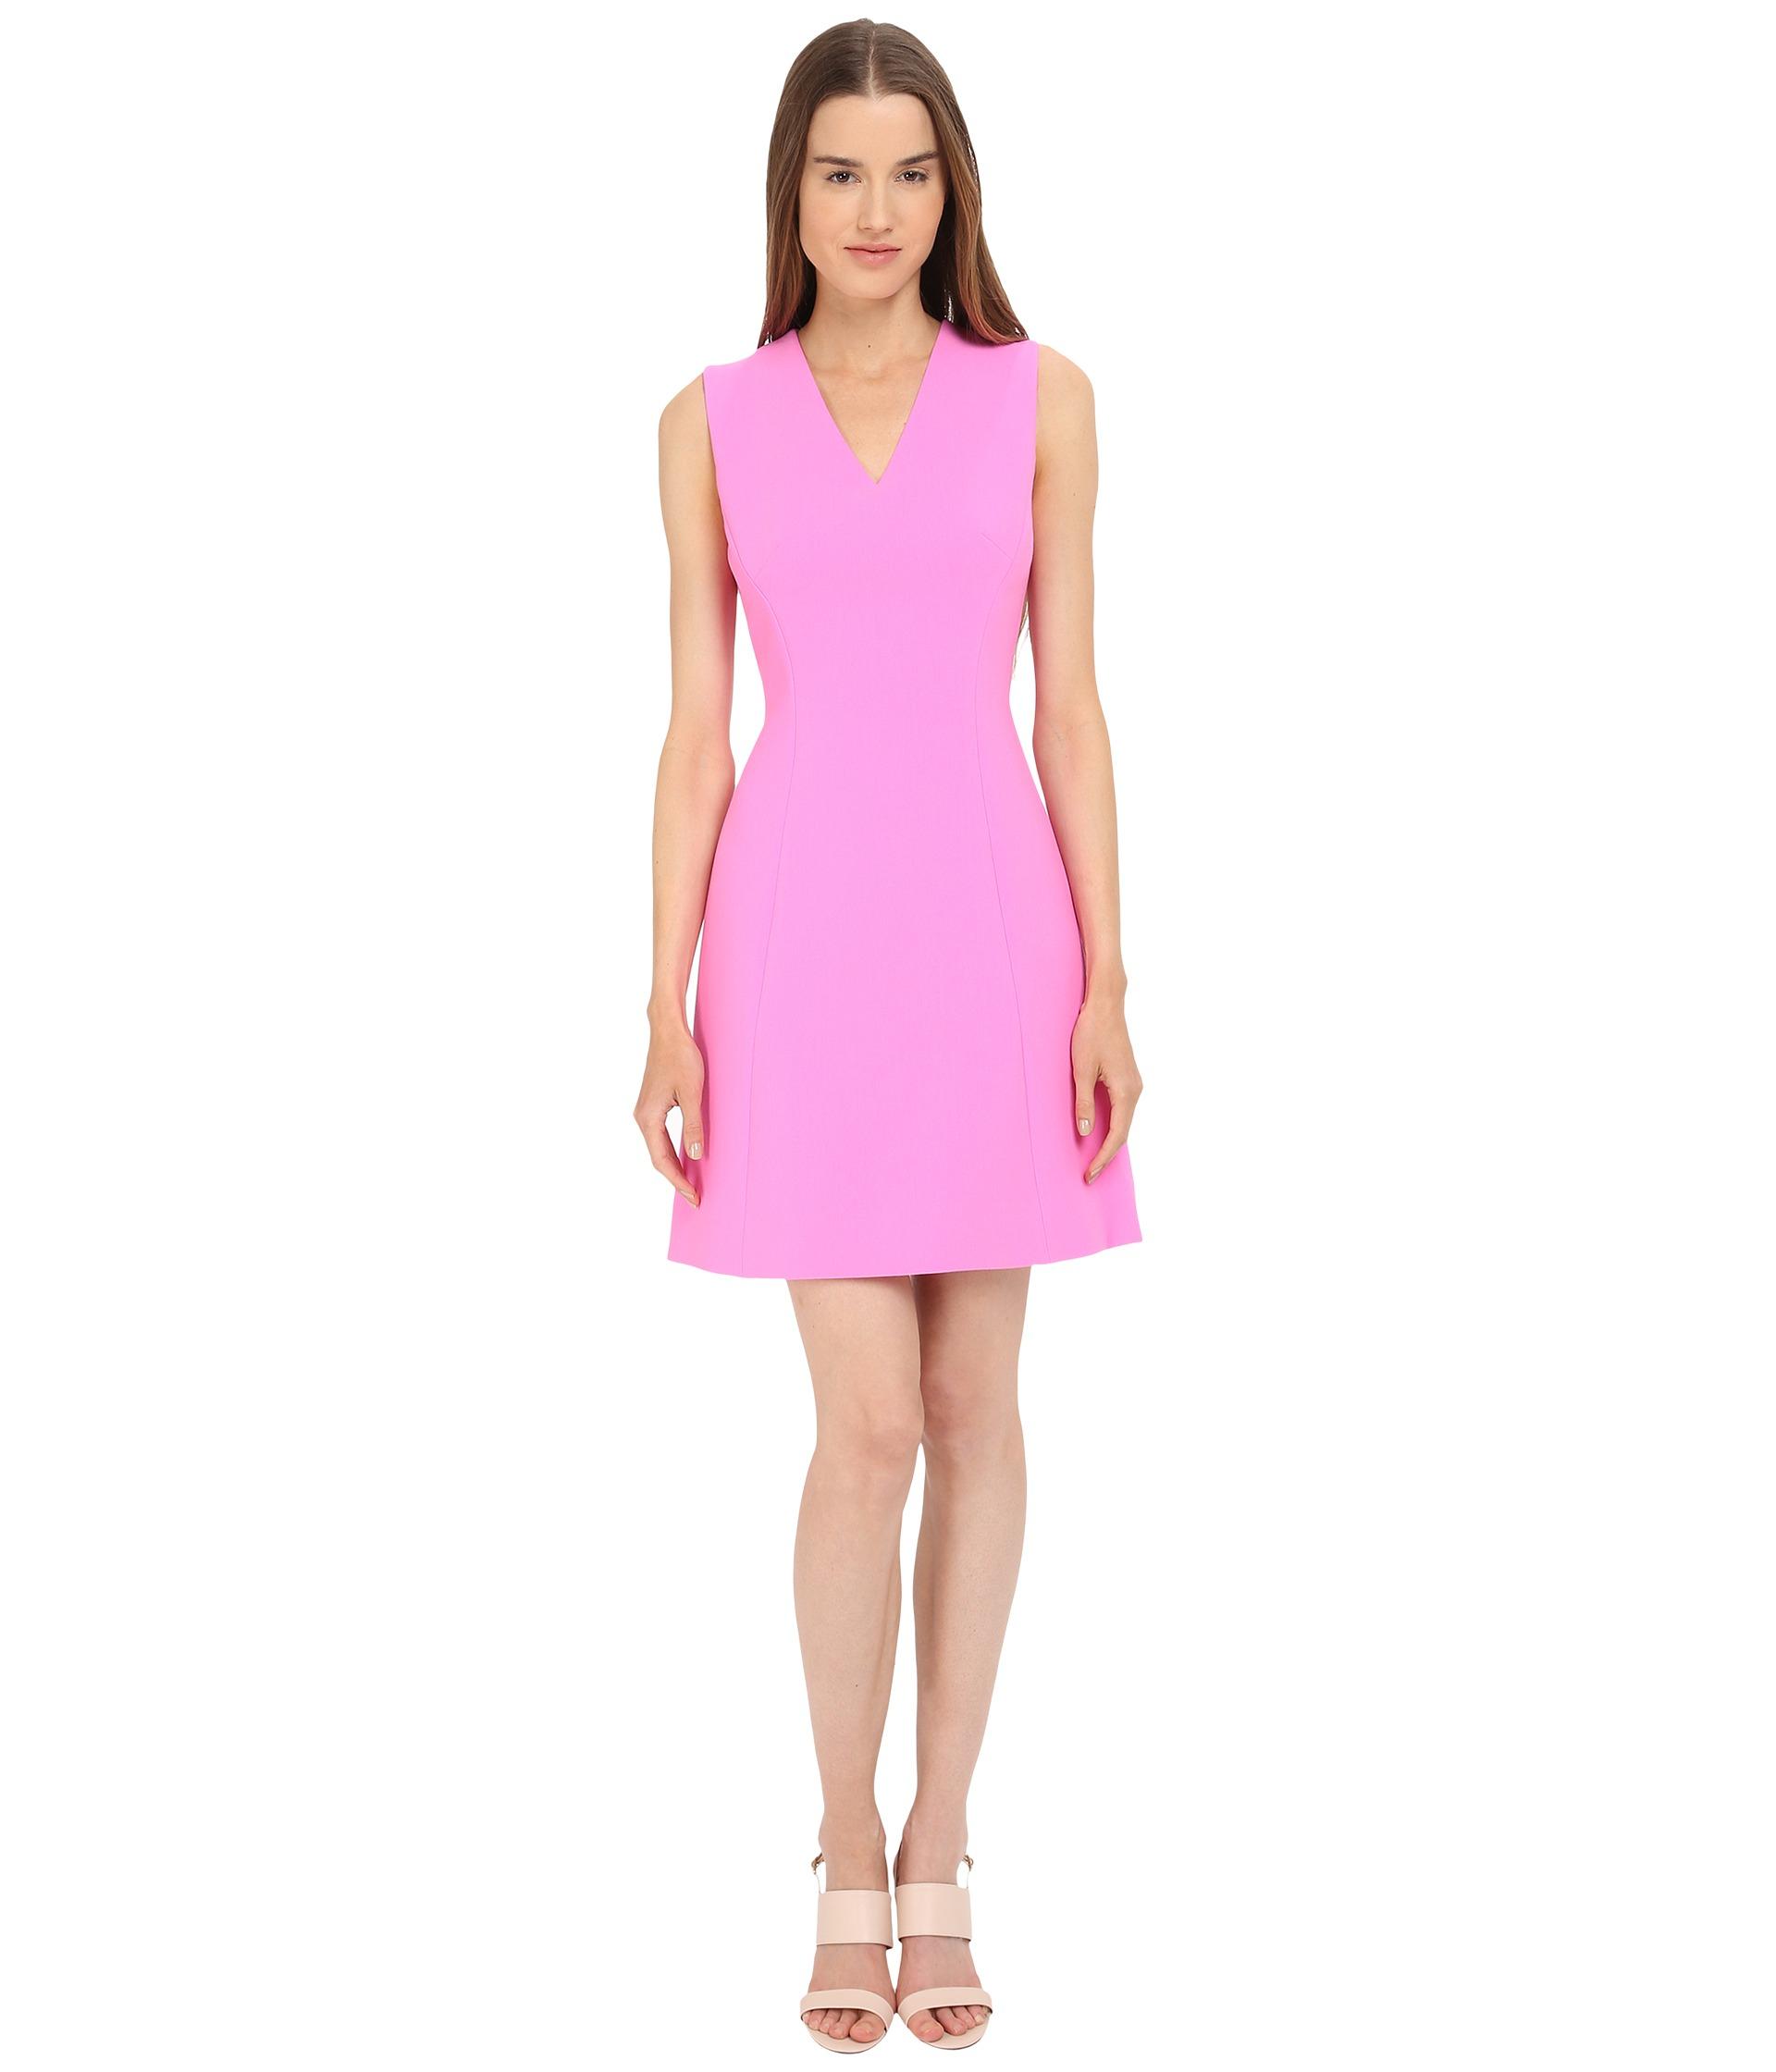 0aeca9ff385d Lyst - Kate Spade Crepe A-line Dress in Pink